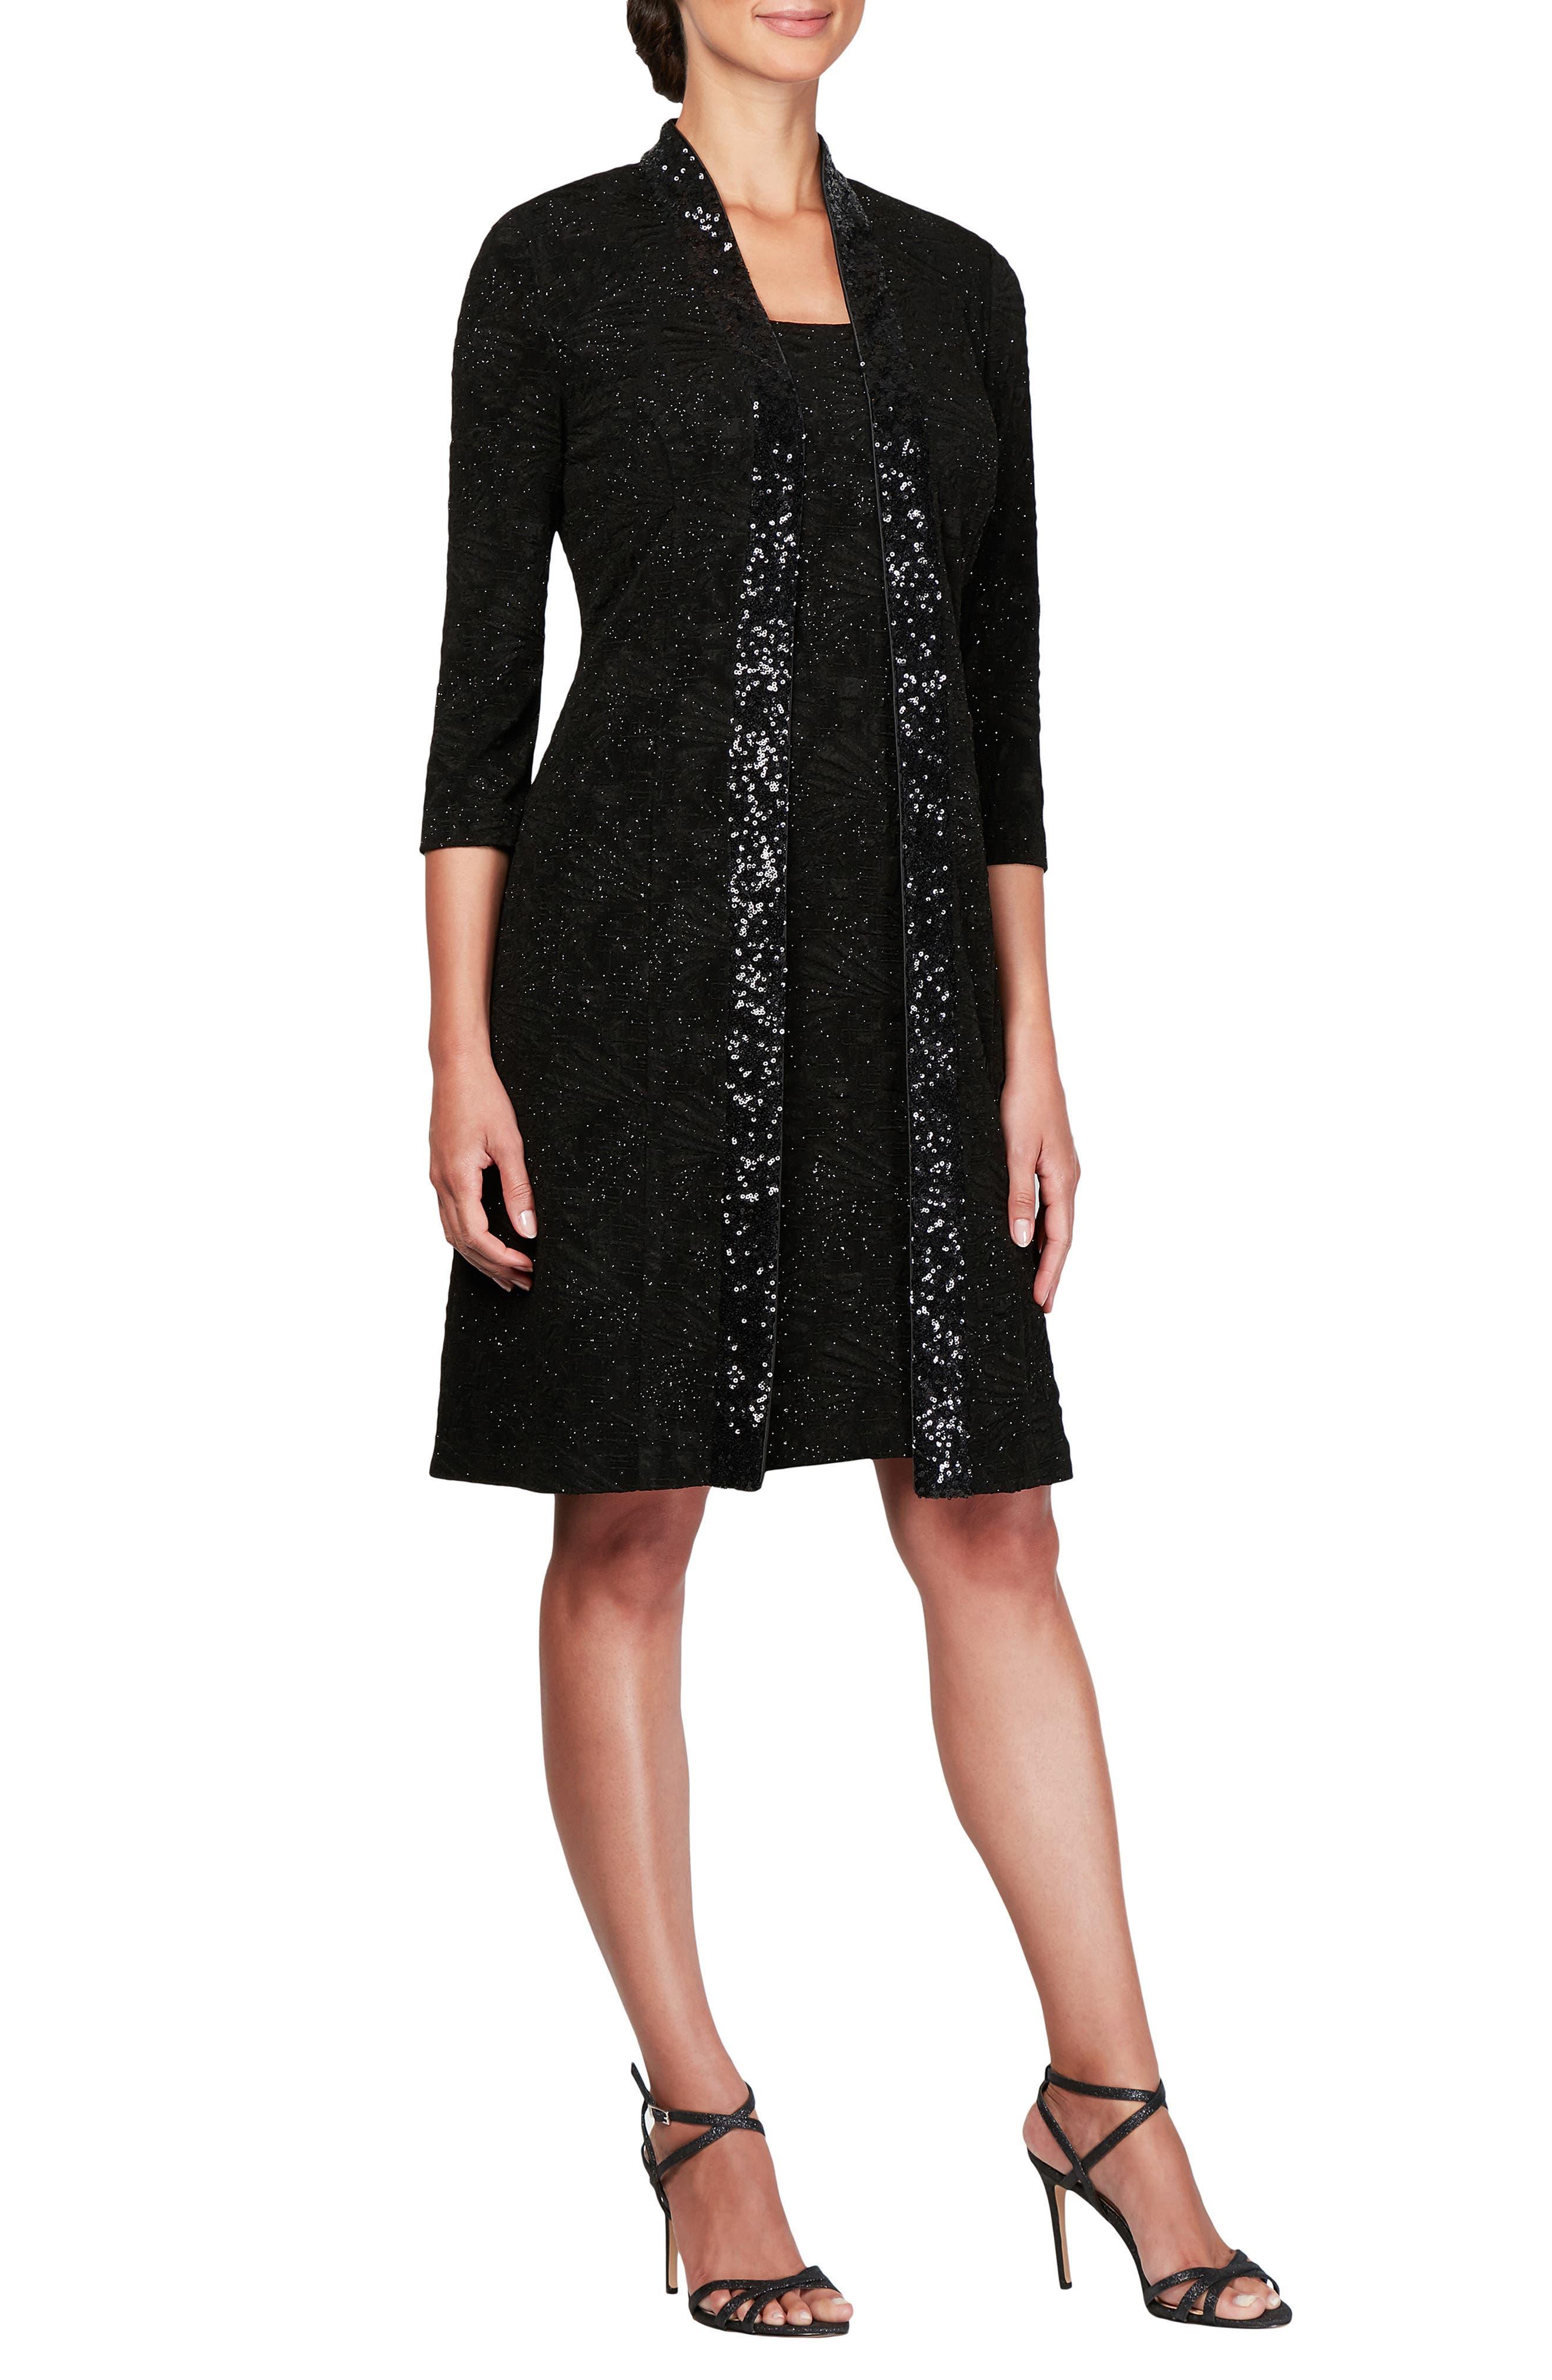 Sequin Shift Dress with Jacket, Main, color, BLACK